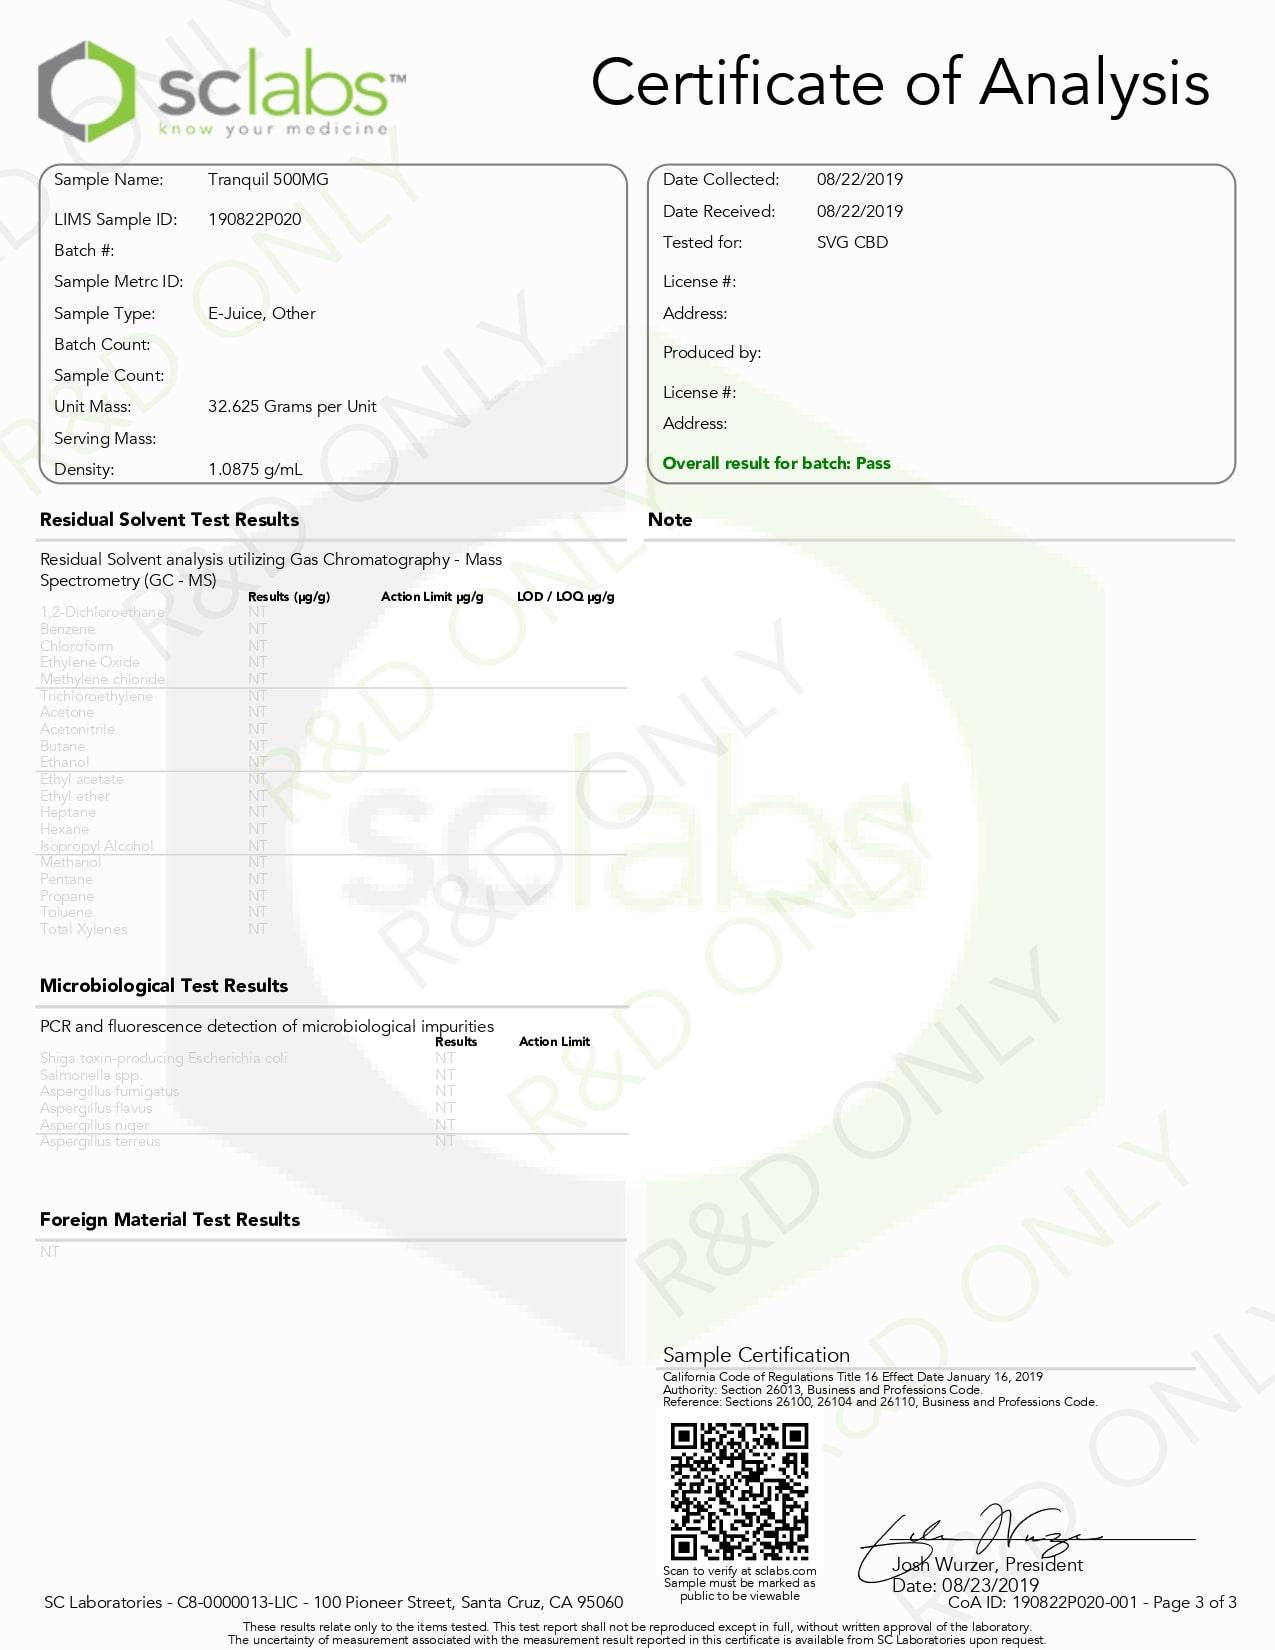 SAVAGE Tranquil CBD Vape Juice 500mg Lab Report